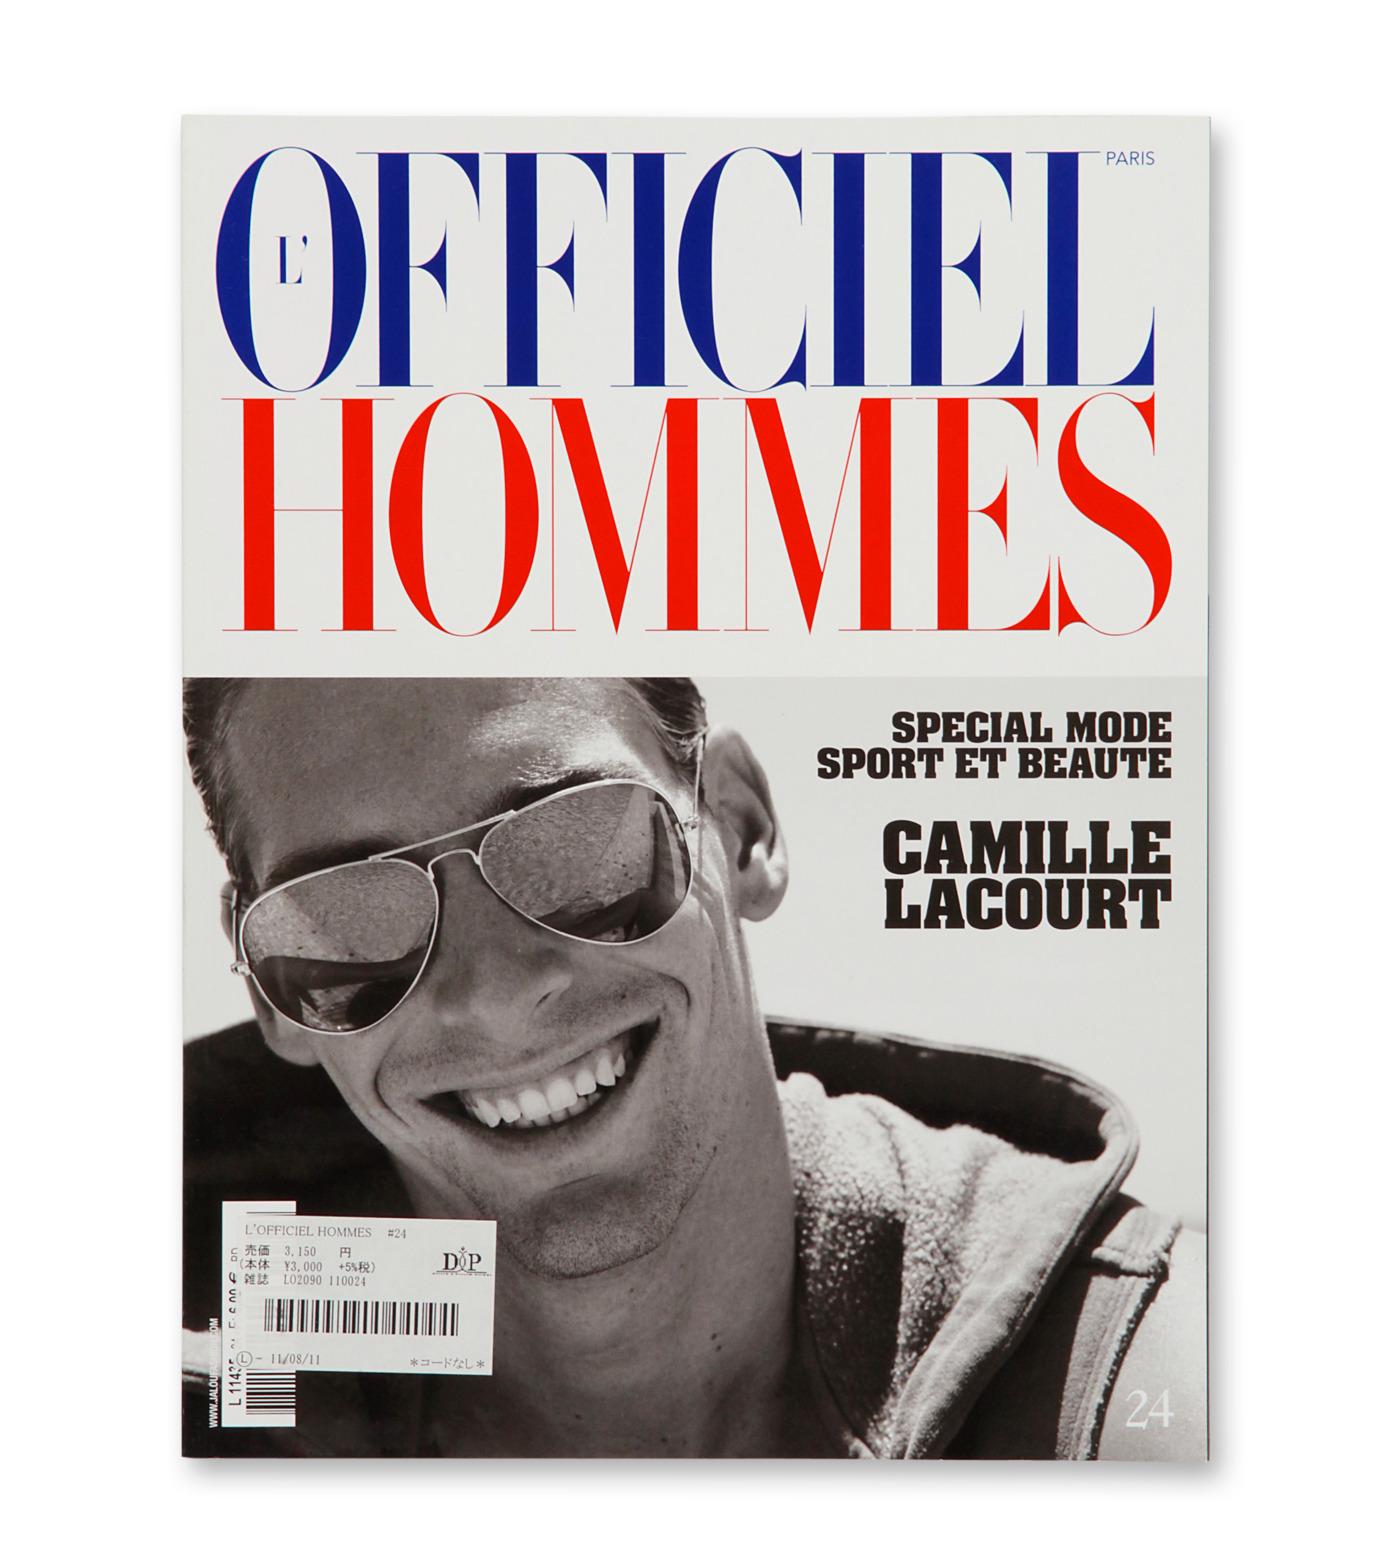 Magazine(マガジン)のL'officiel homme-NONE(インテリア/OTHER-GOODS/interior/OTHER-GOODS)-I-LO2090024-0 拡大詳細画像1